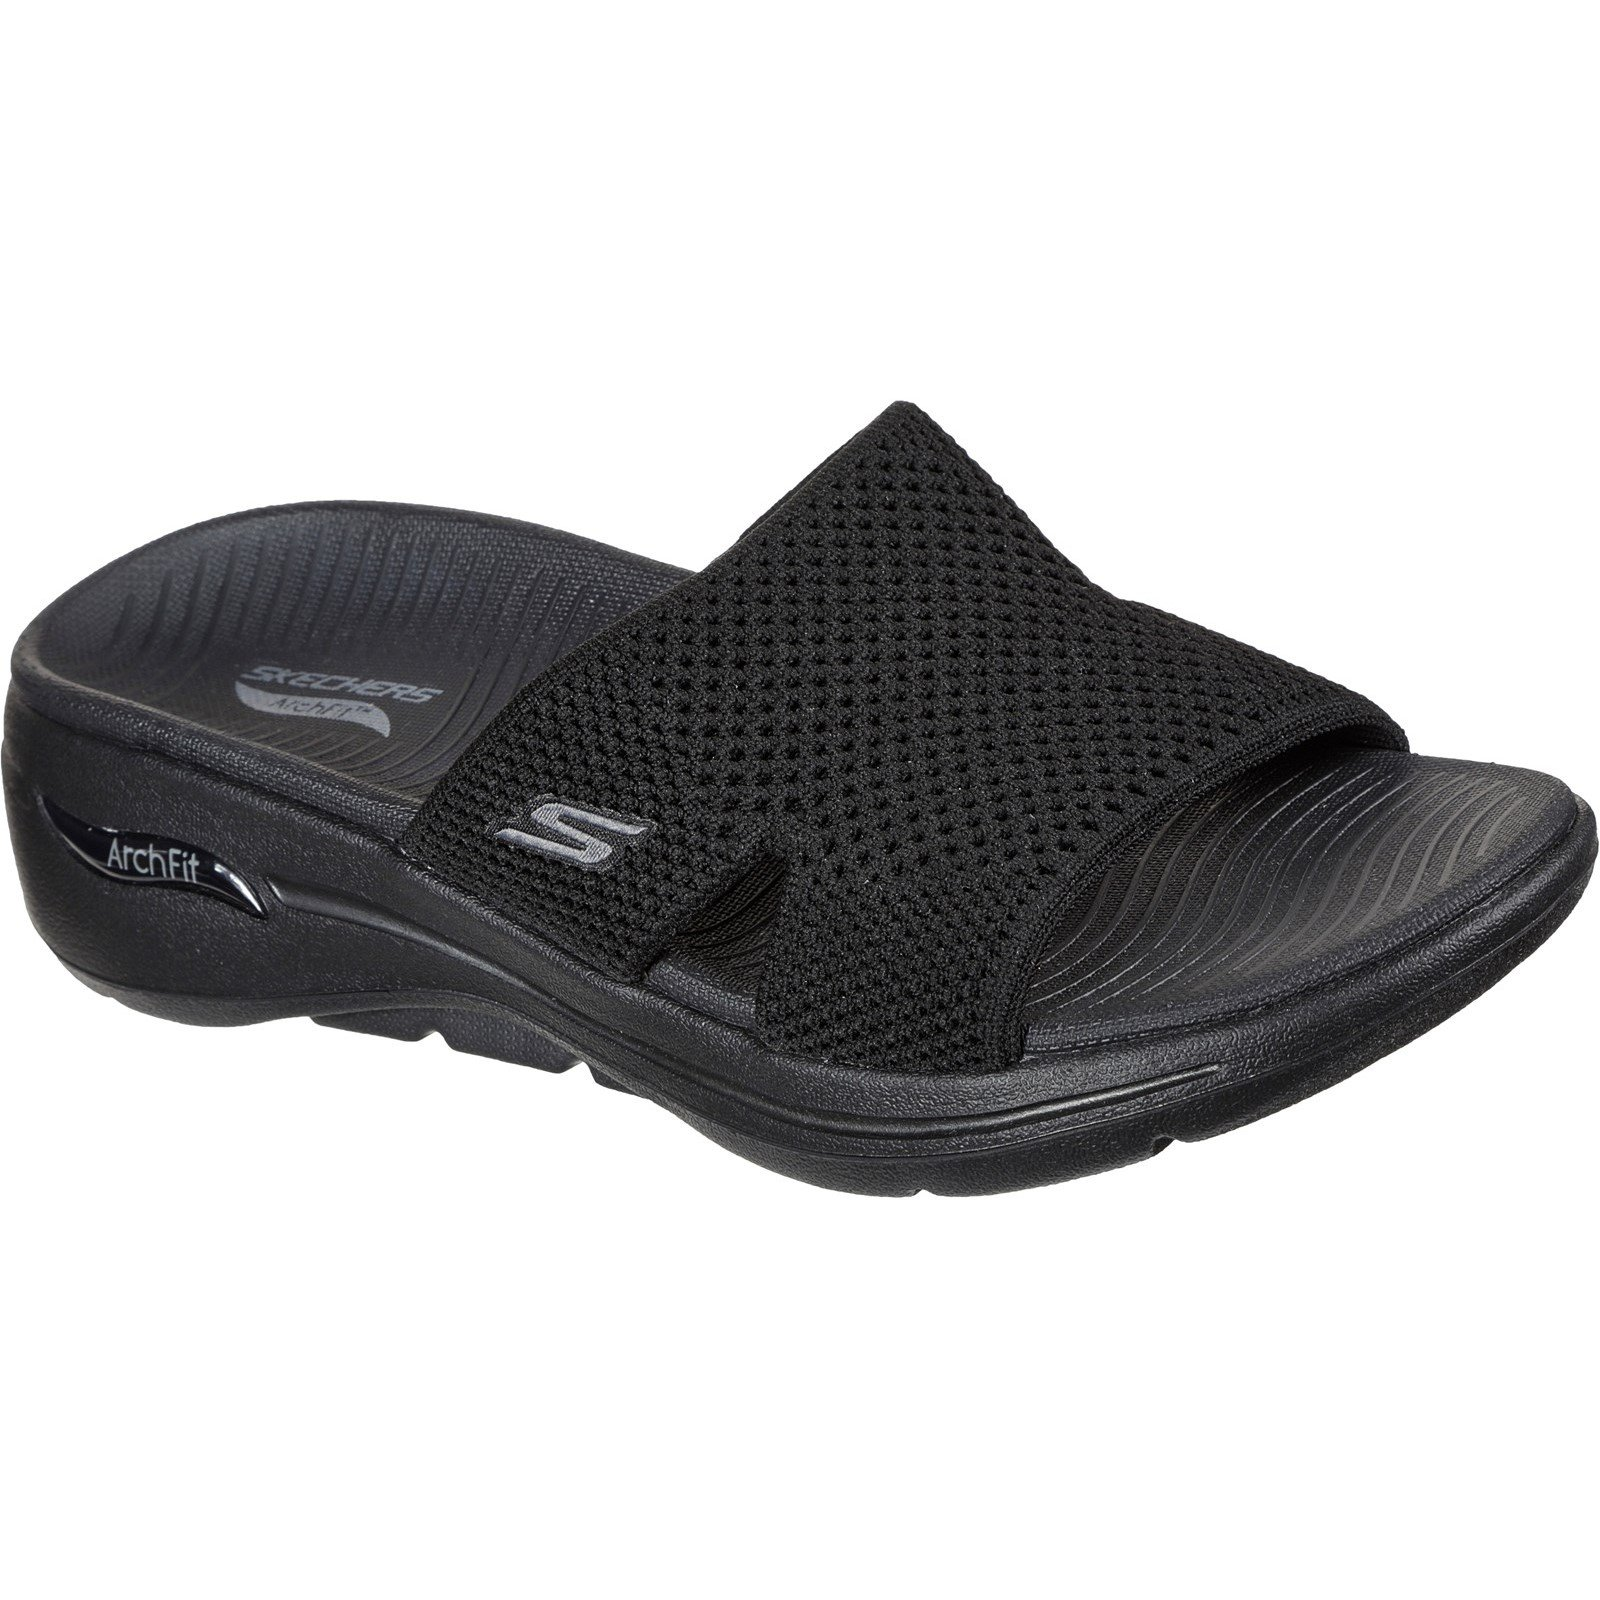 Skechers Women's Go Walk Arch Fit Worthy Summer Sandal Various Colours 32152 - Black 4